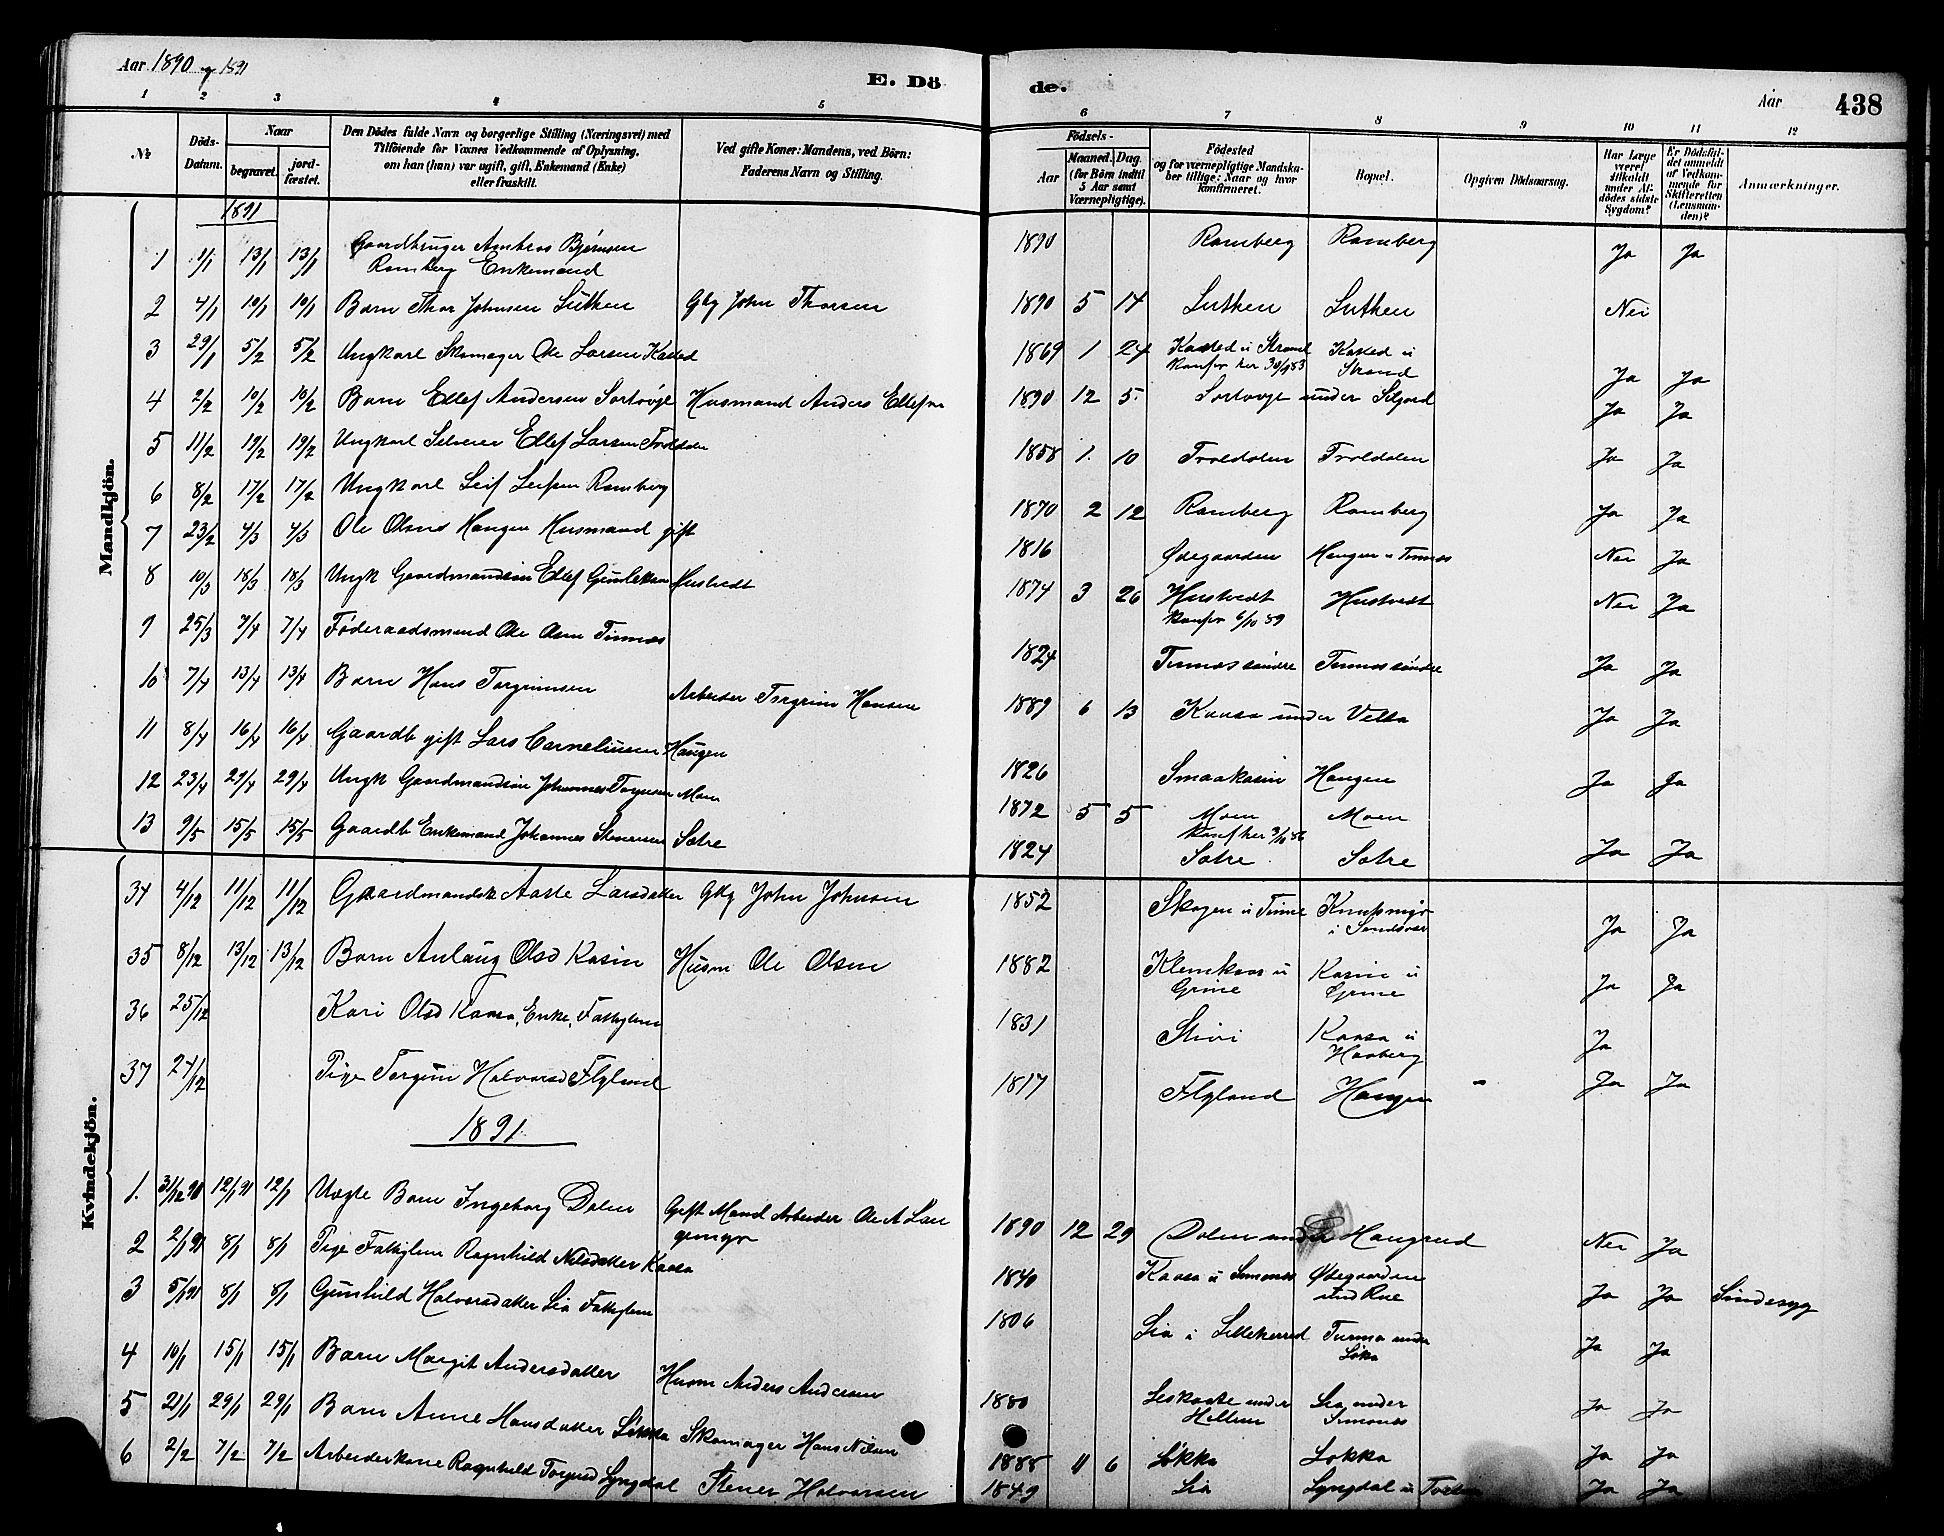 SAKO, Heddal kirkebøker, G/Ga/L0002: Klokkerbok nr. I 2, 1879-1908, s. 438